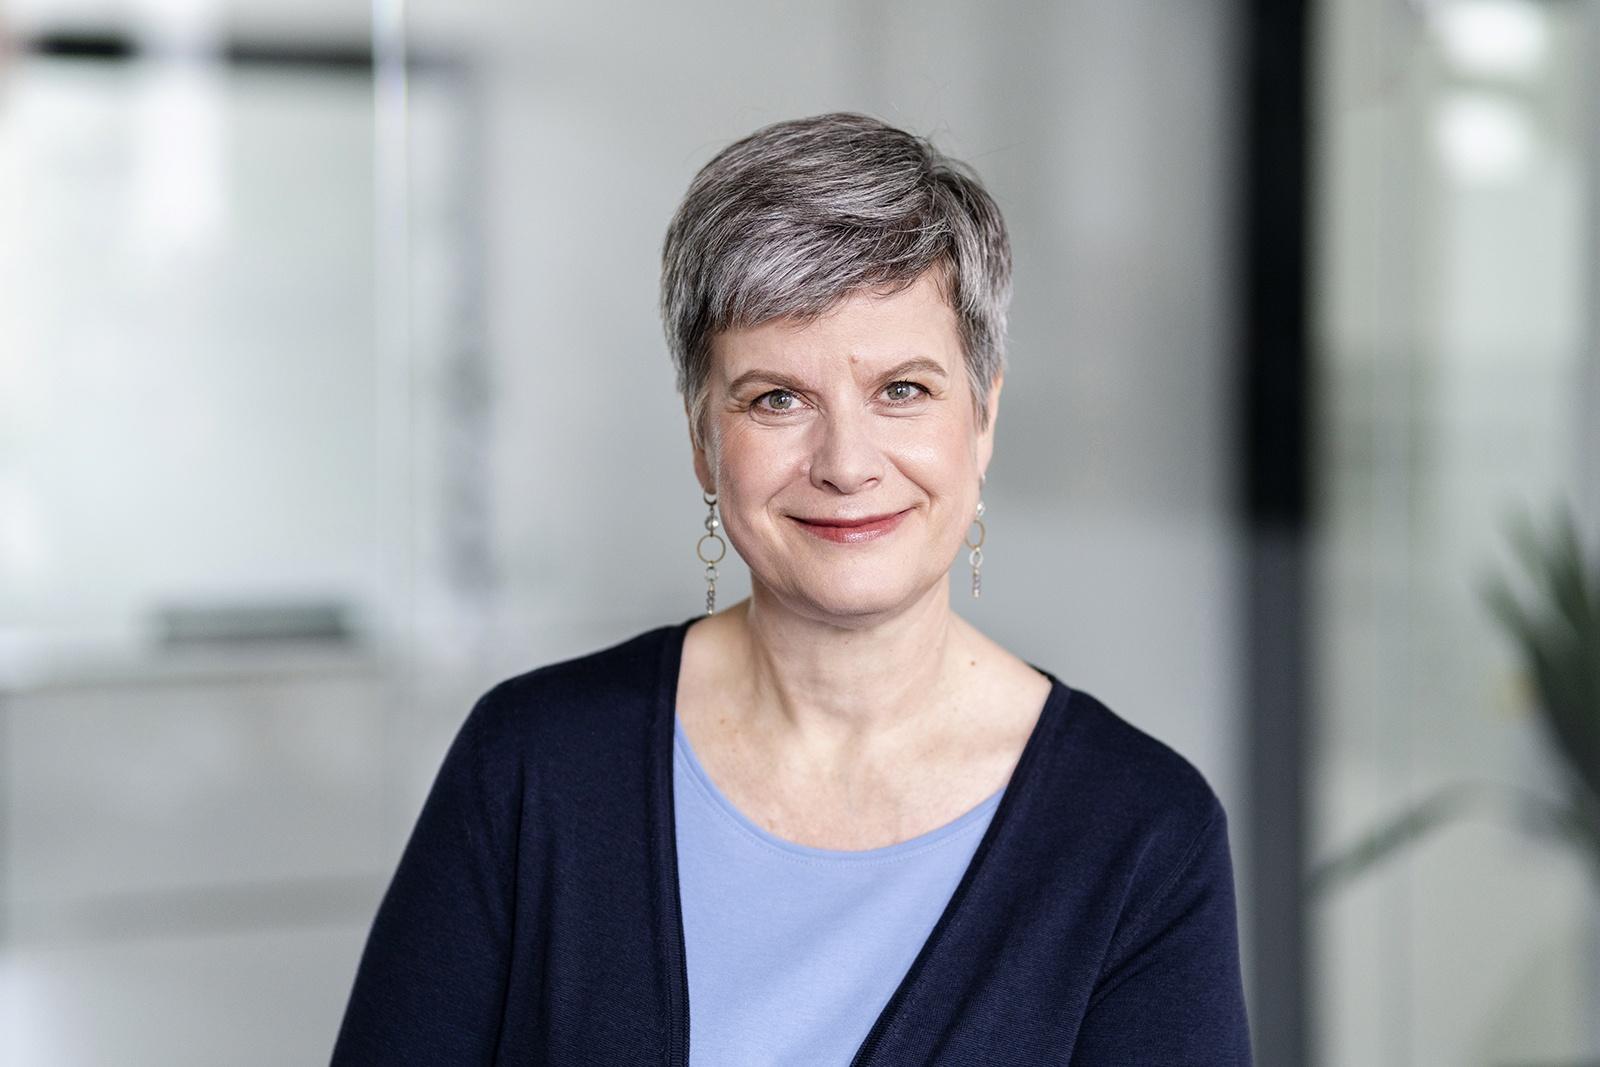 Johanna Friedrich